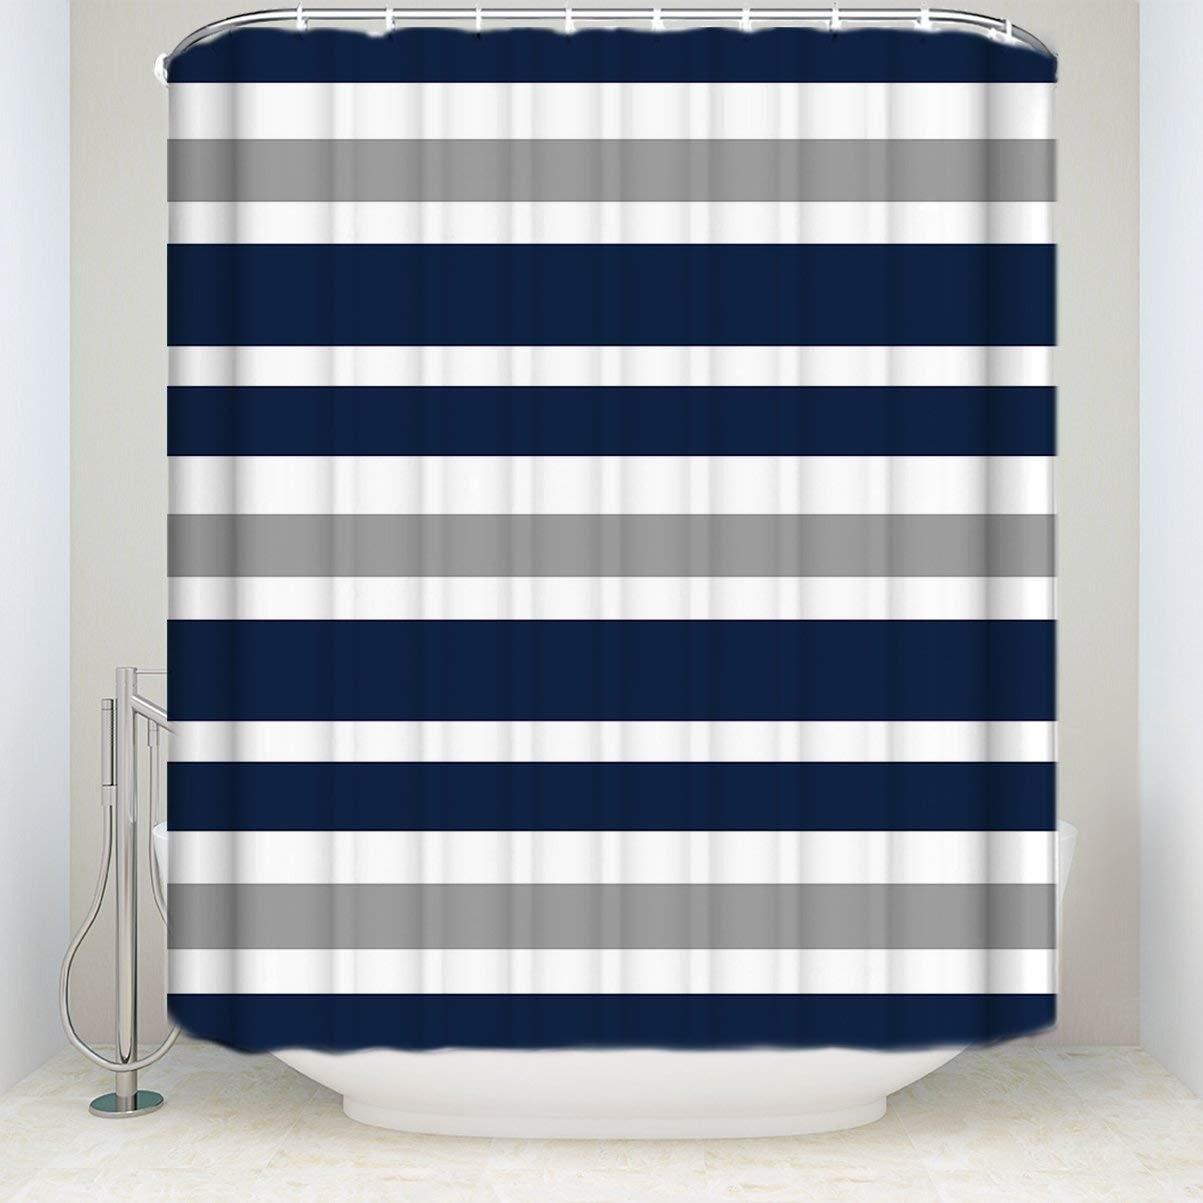 designs navy blue gray and white kids bathroom fabric bath teen stripe shower curtain